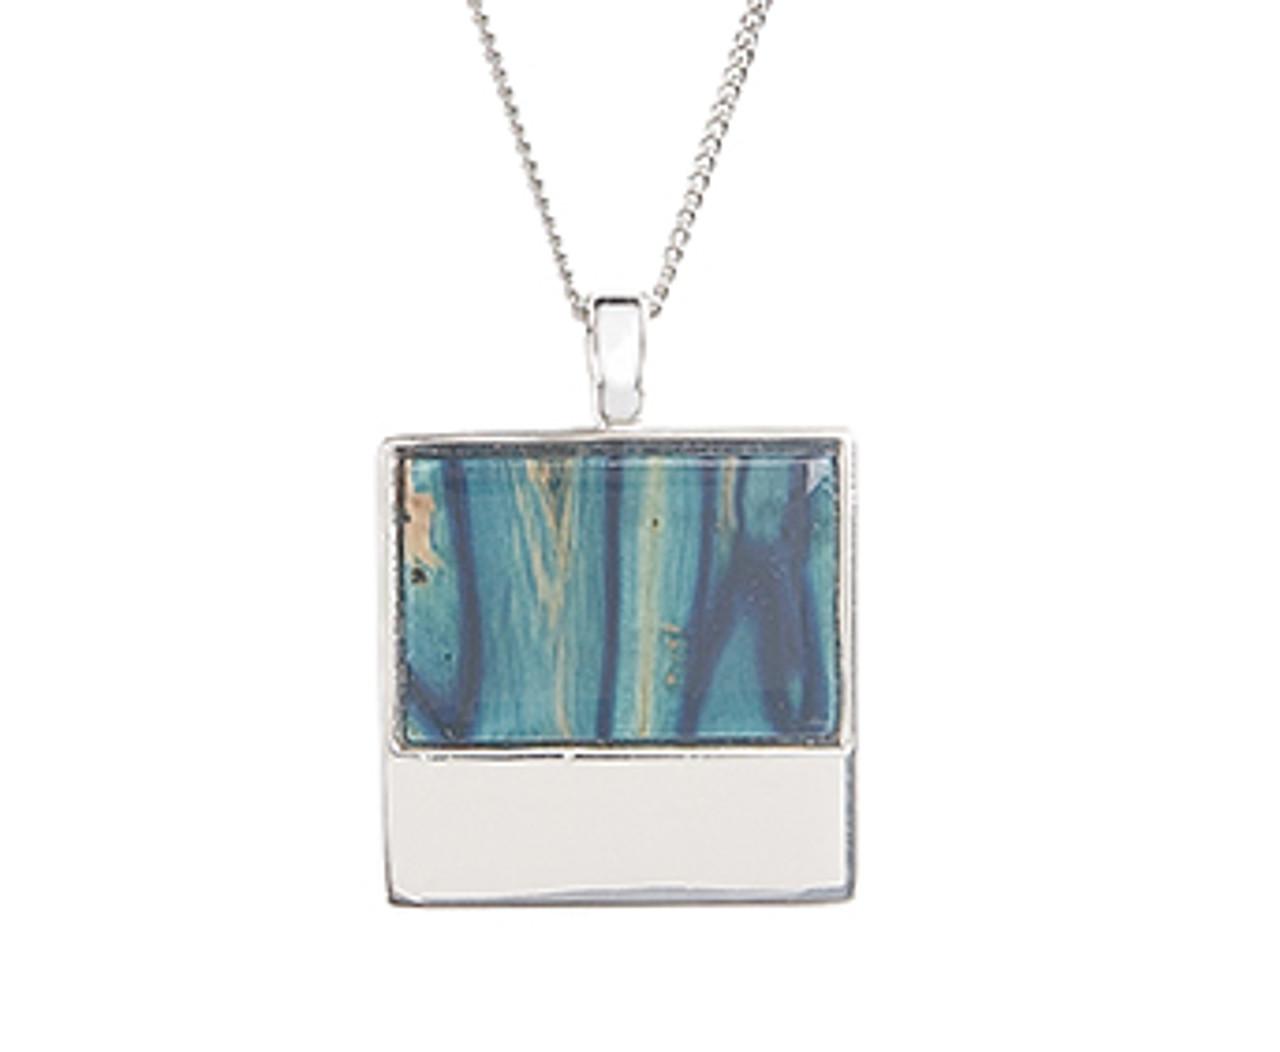 Skye Silver Square Pendant Necklace